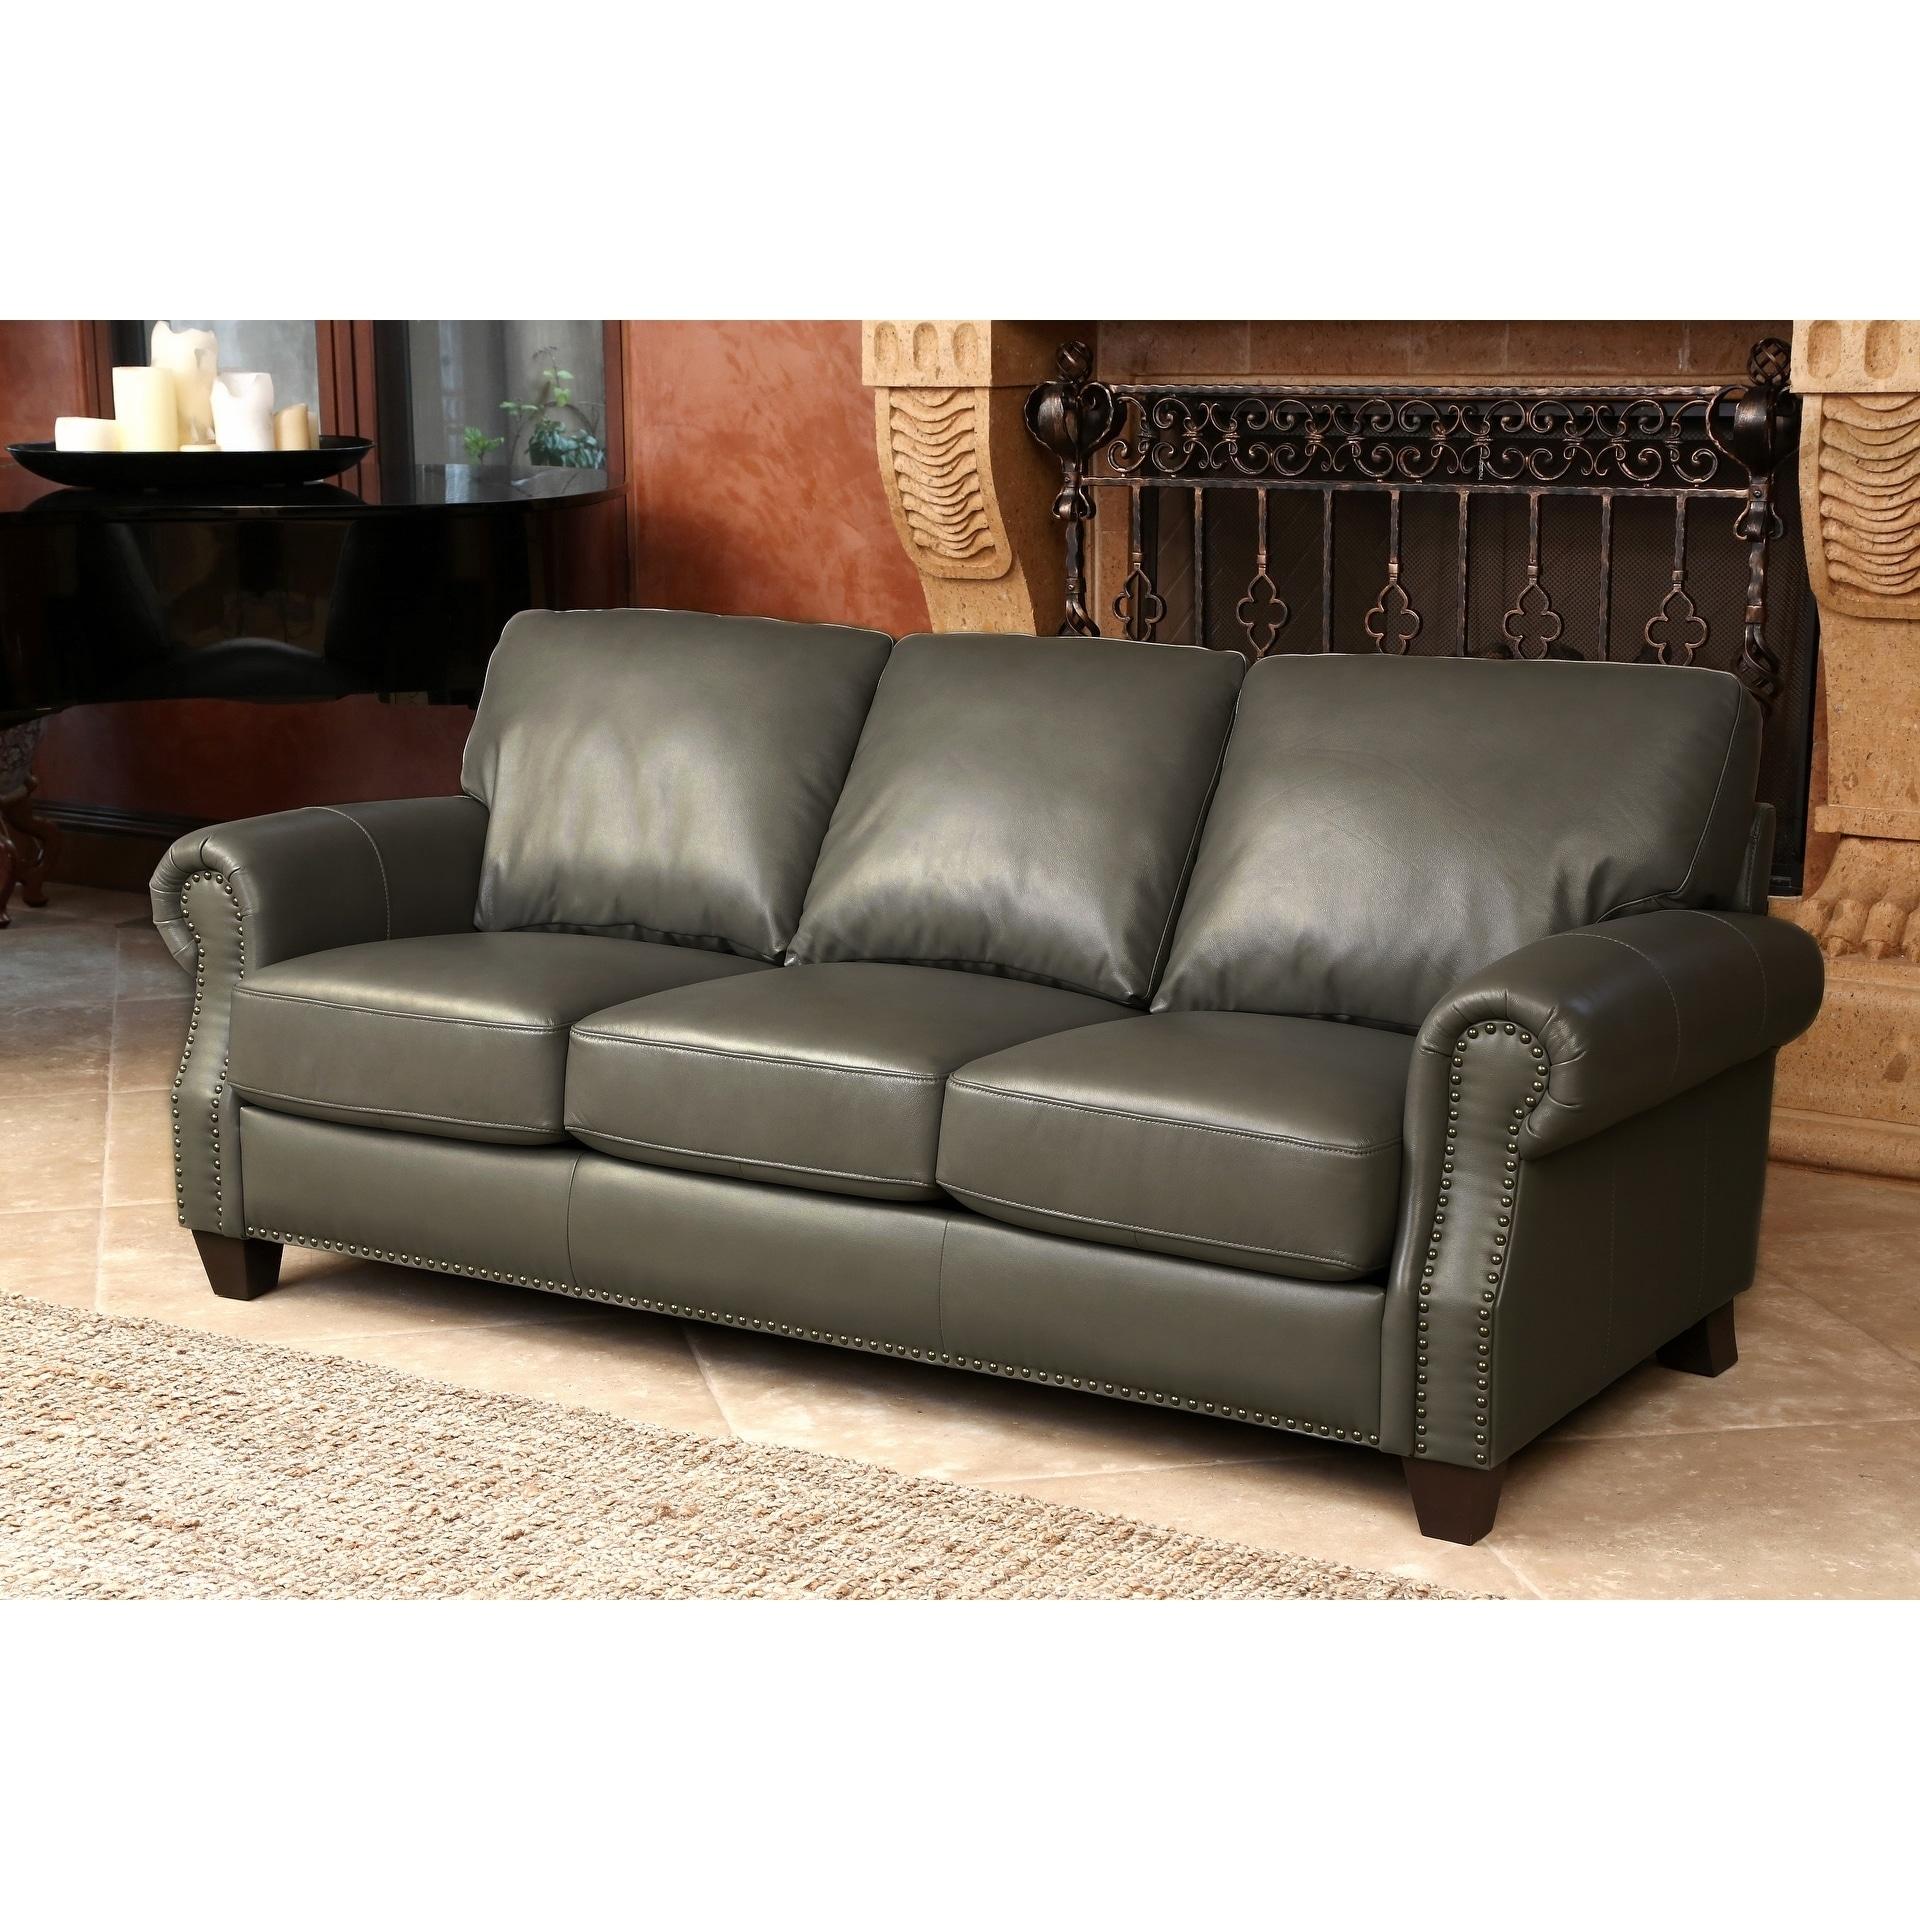 Abbyson Landon Top Grain Leather Sofa Free Shipping Today  ~ Full Top Grain Leather Sofa